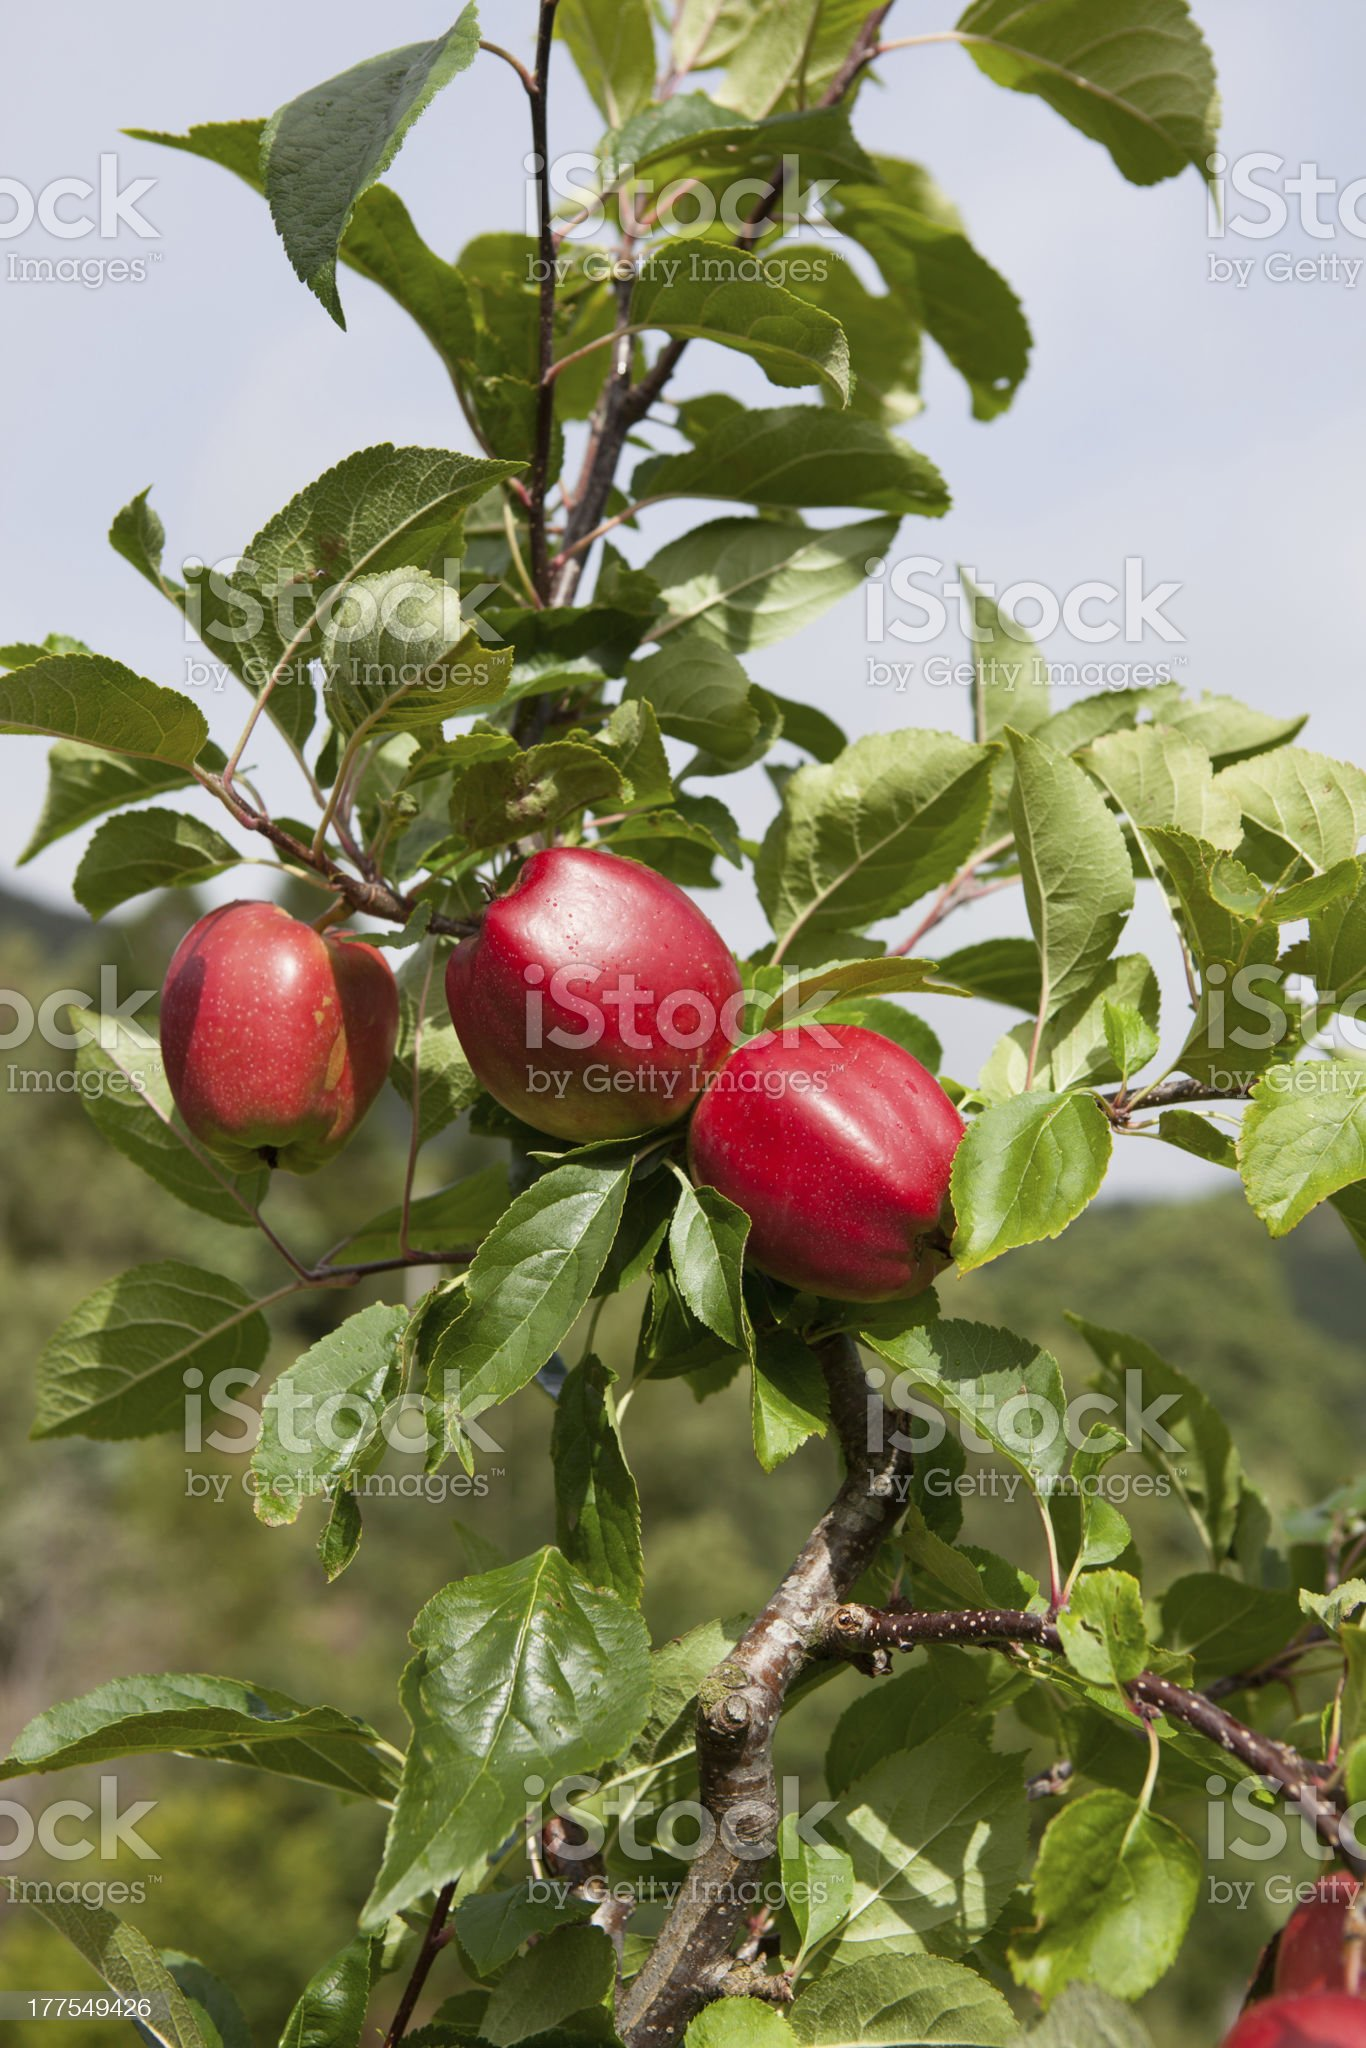 Ripe Apples royalty-free stock photo